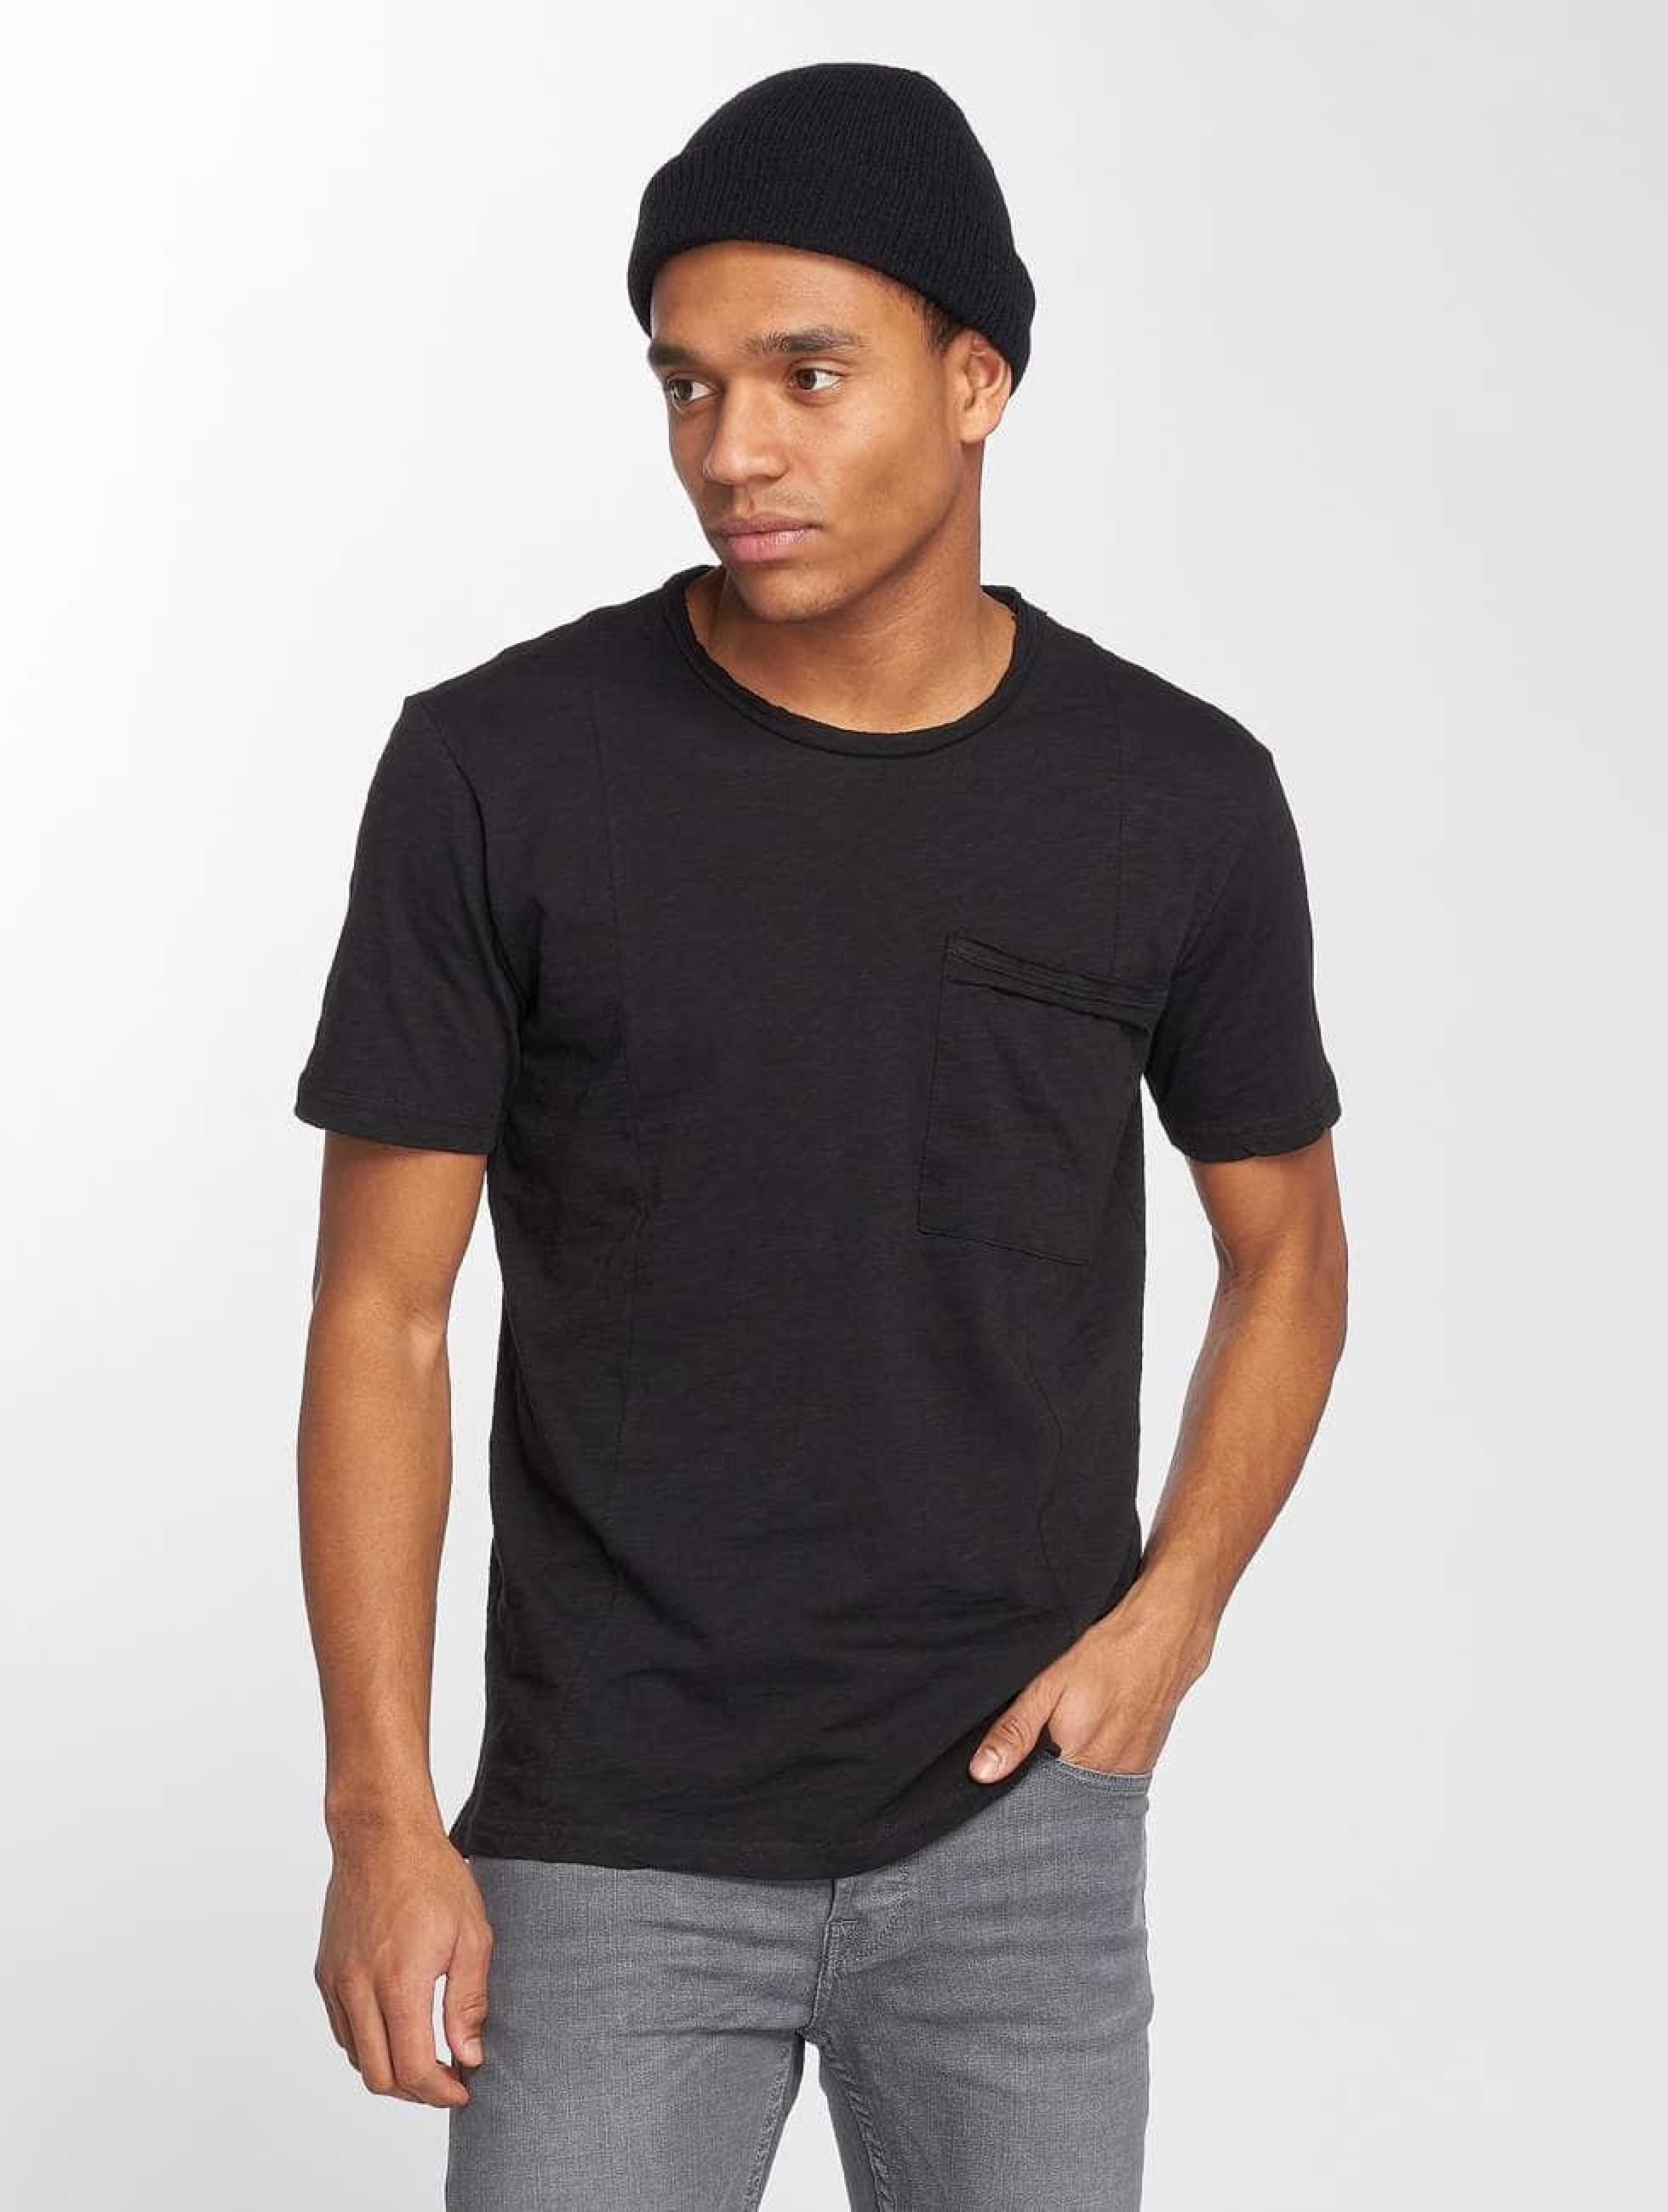 Bangastic / T-Shirt Monde in black S